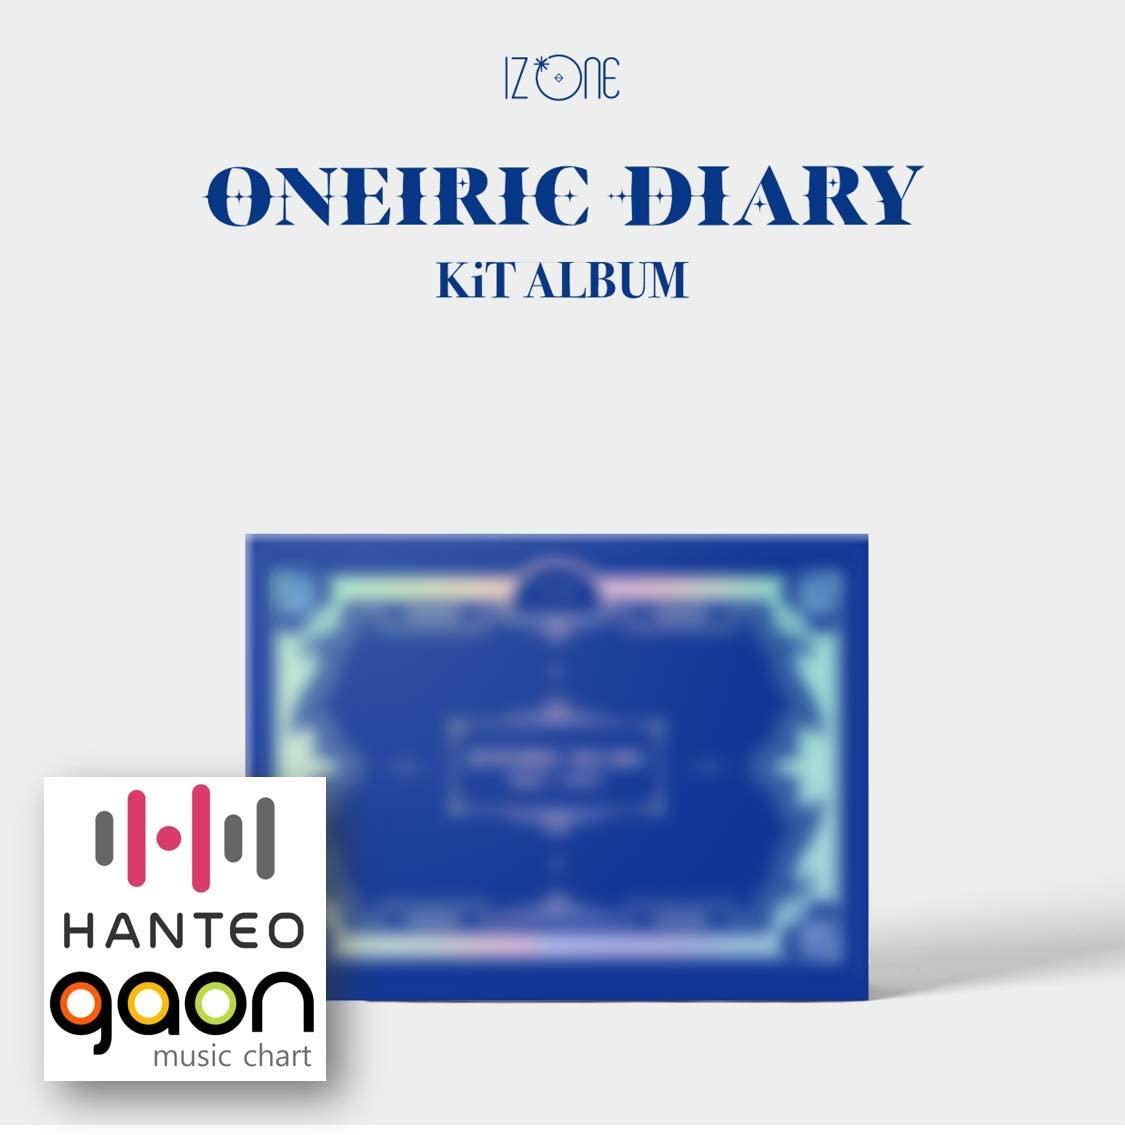 IZONE Album - Oneiric Diary 幻想日記 [Kit Album] (3rd Mini Album) [Pre Order] Album Package with Extra Decorative Sticker Set, Photocard Set